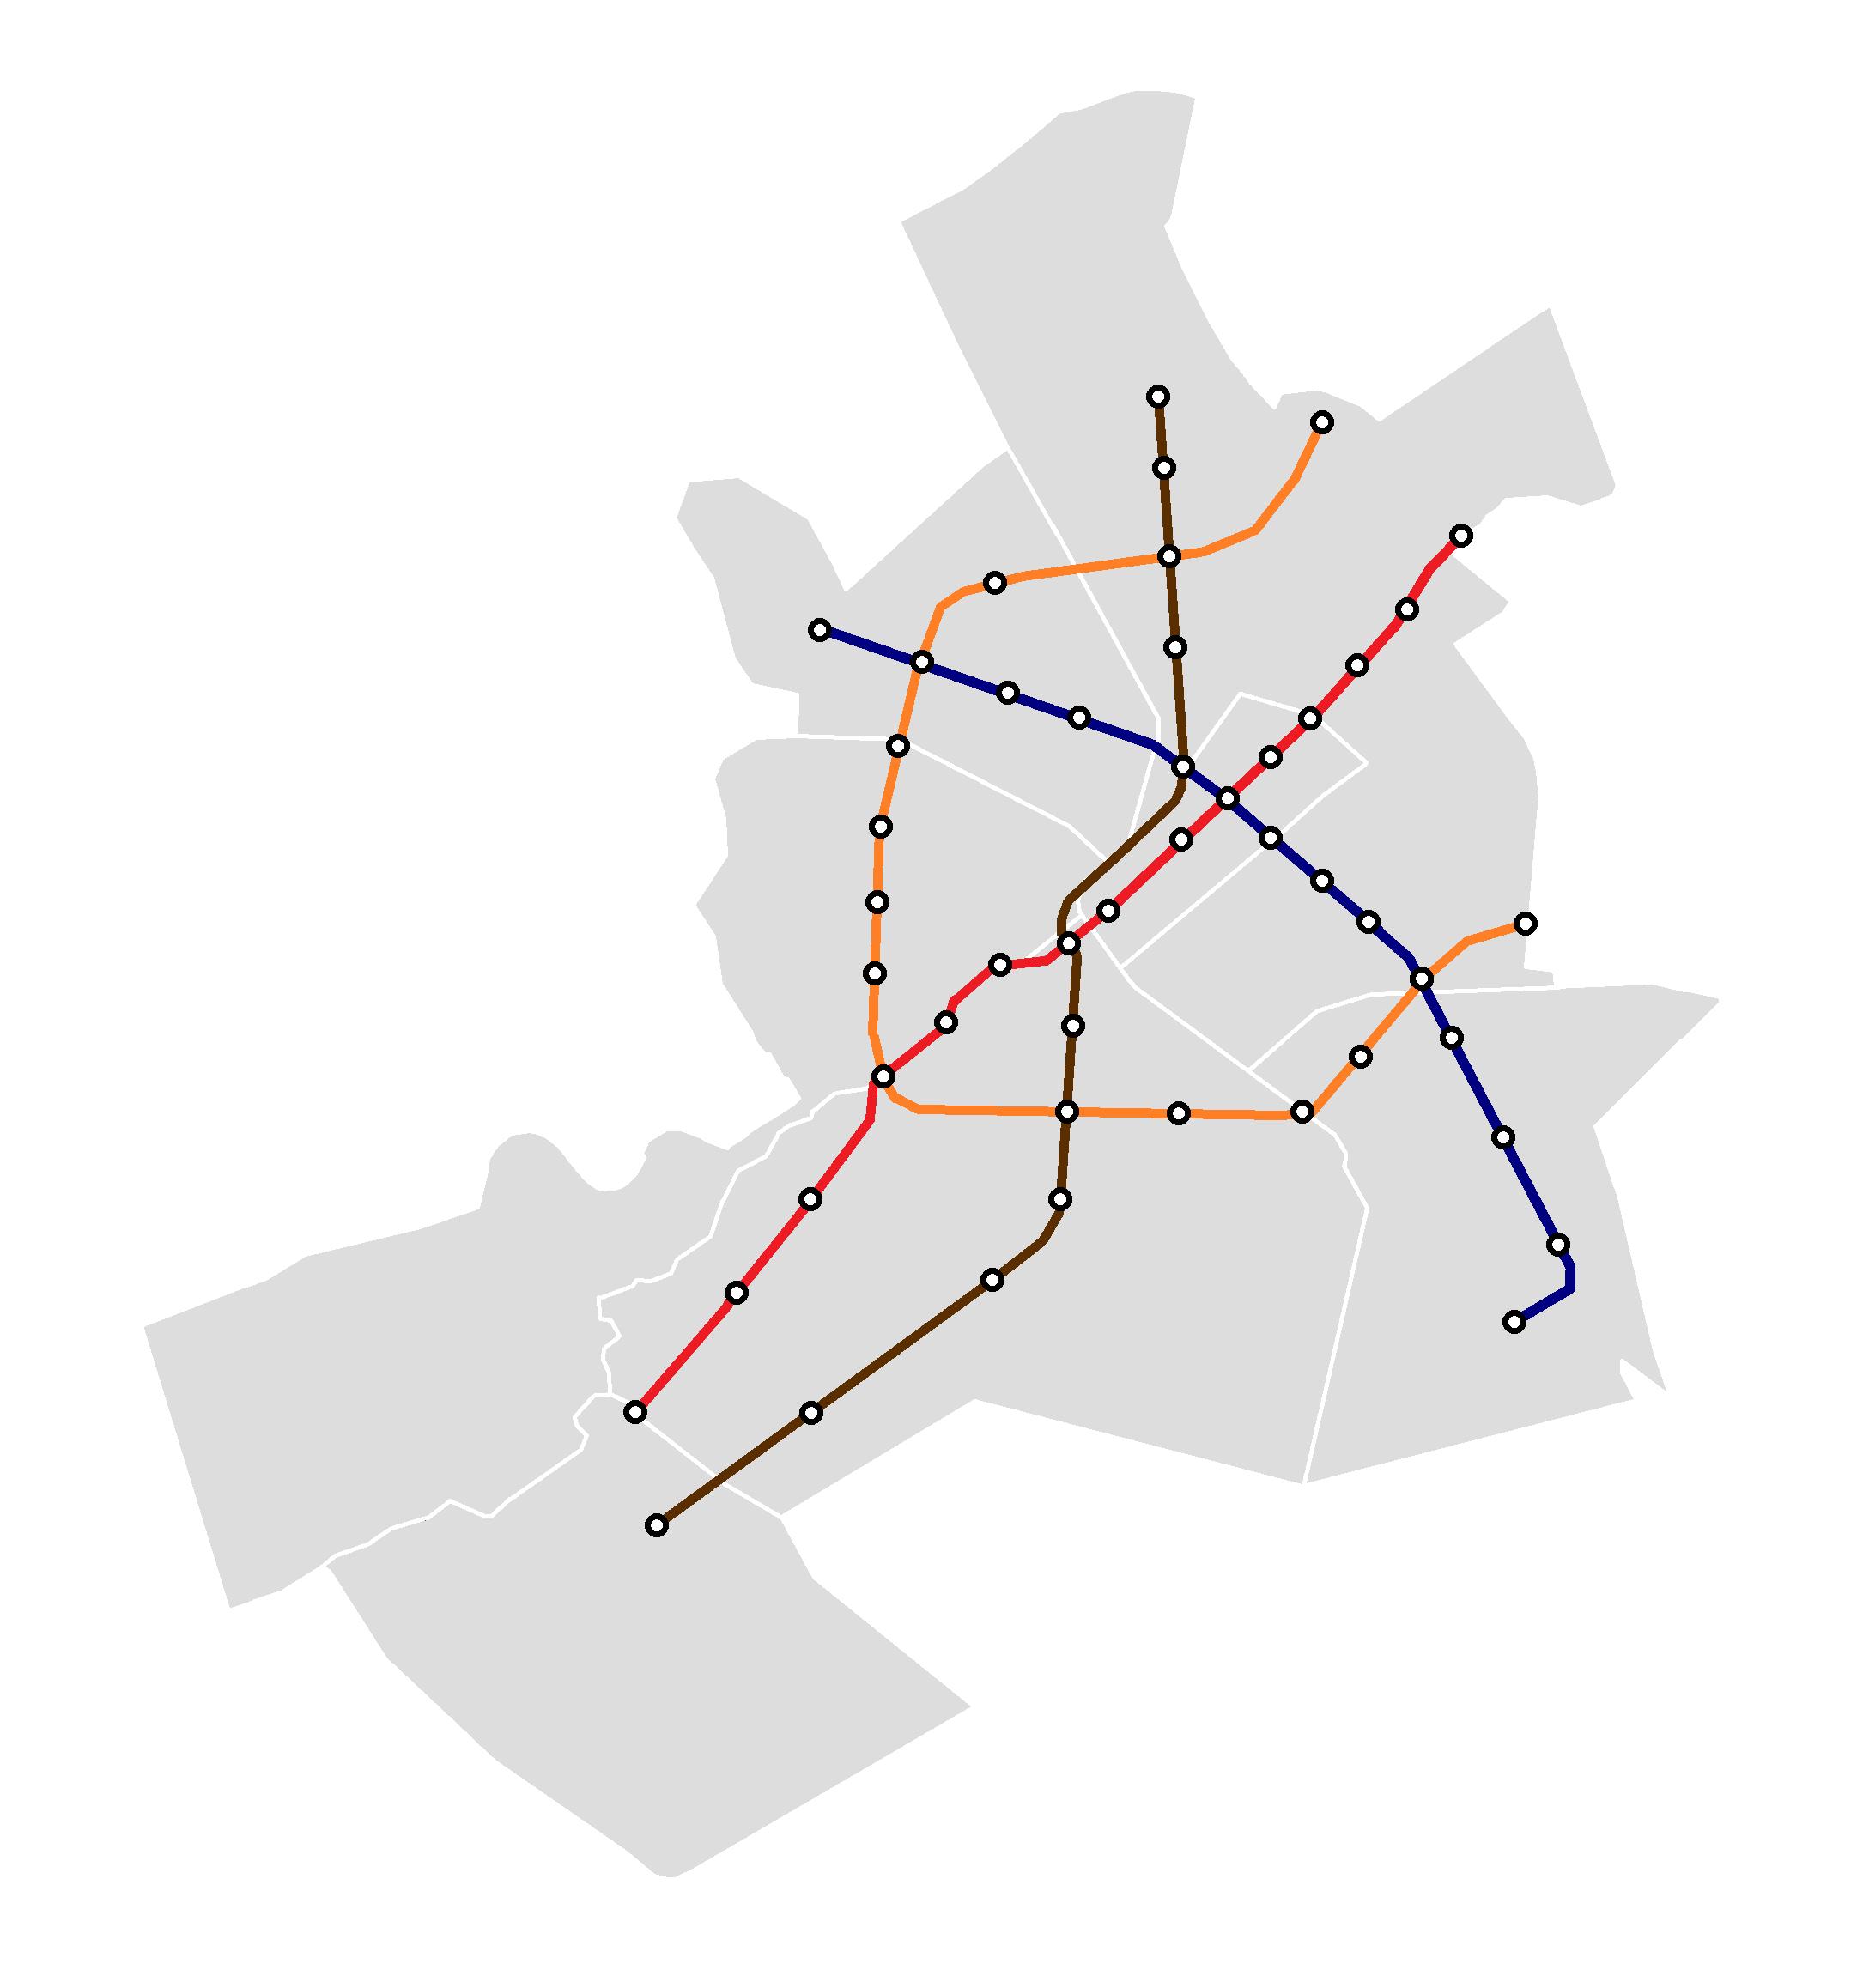 FileQom Metro mapFuturegeopng Wikimedia Commons